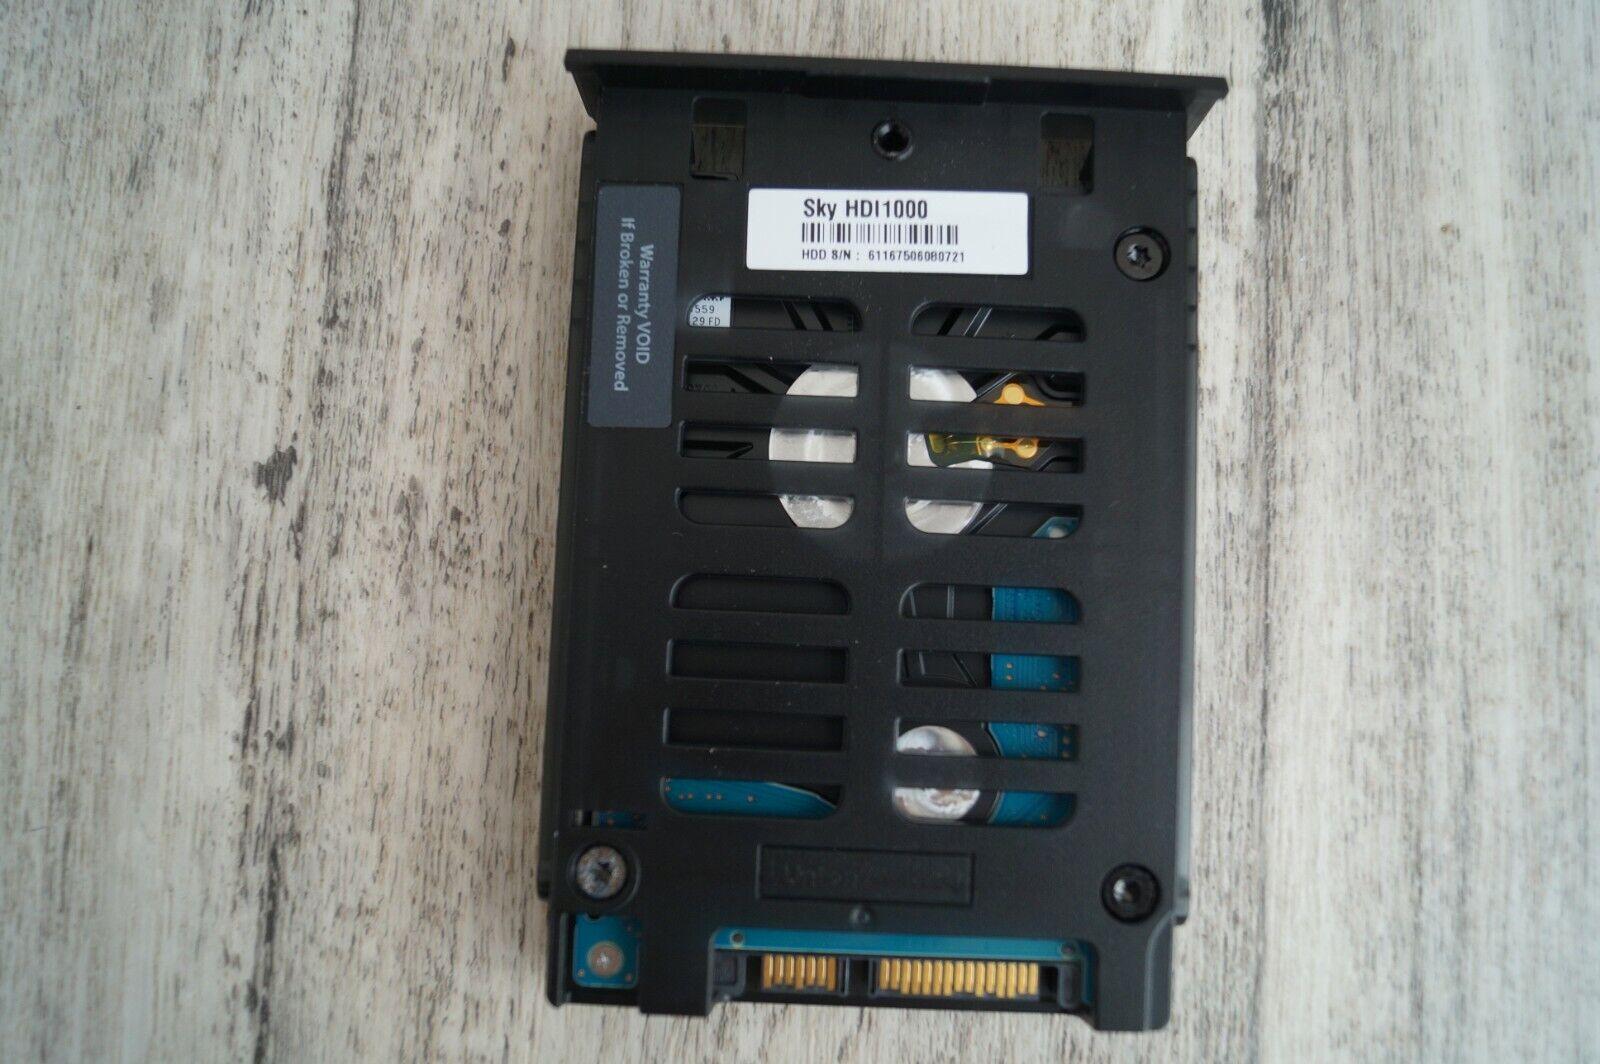 Seagate 1TB Festplatte Model: SDC001